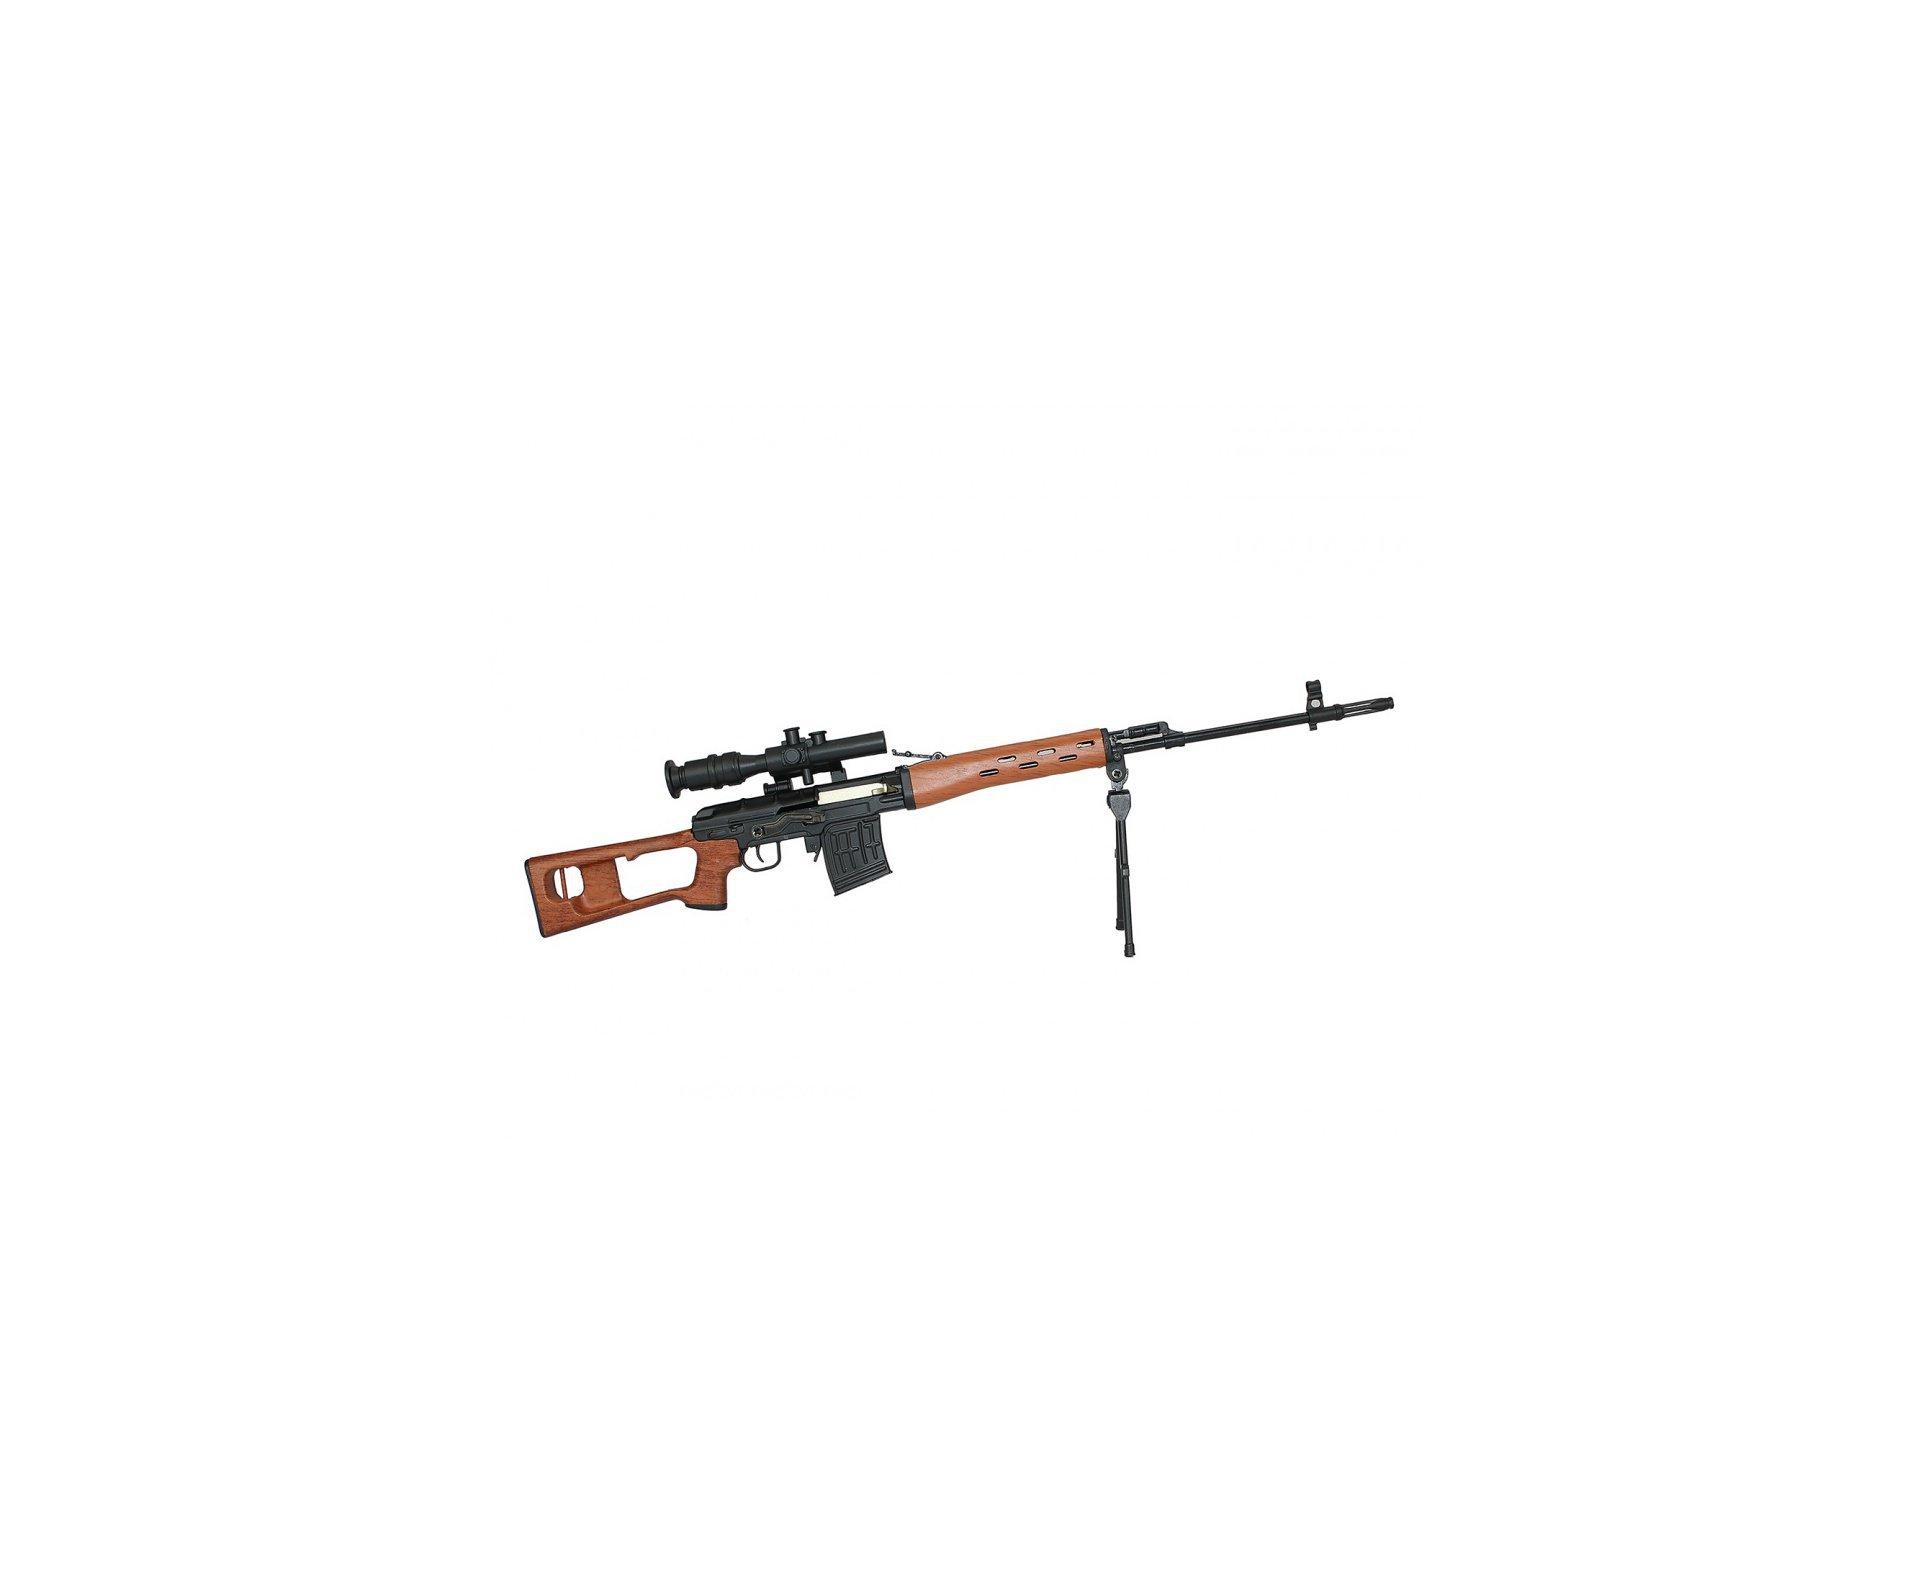 Rifle Sniper Dragunov Clássica Miniatura Metálica - Arsenal Guns